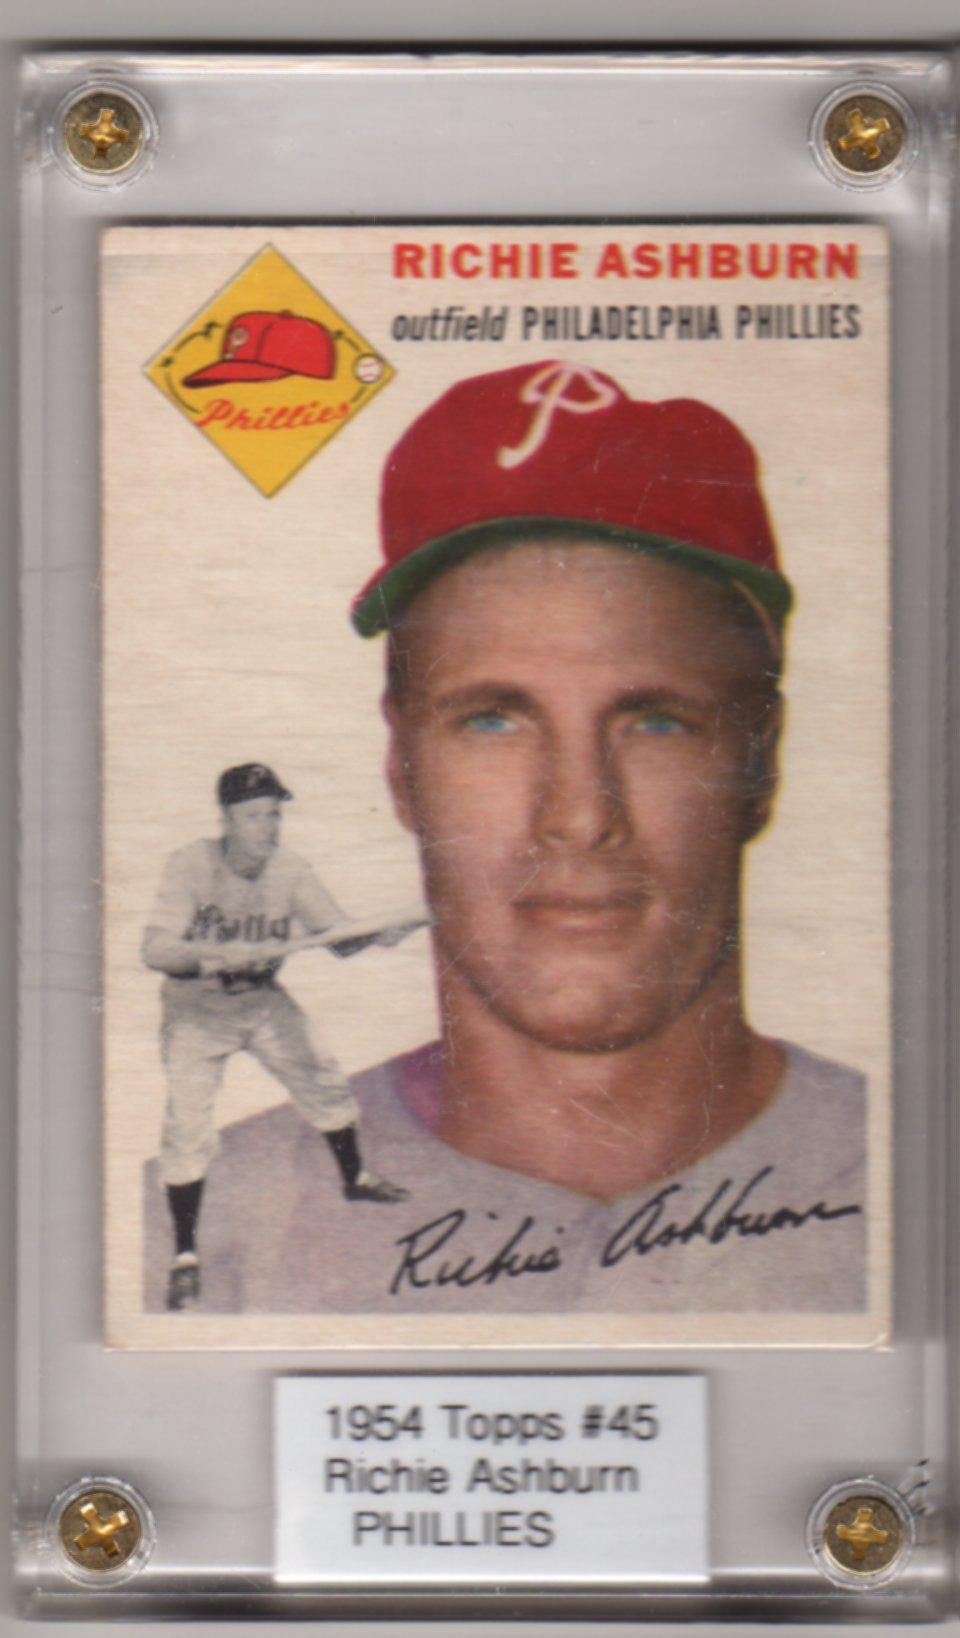 1954 Topps #45 Richie Ashburn